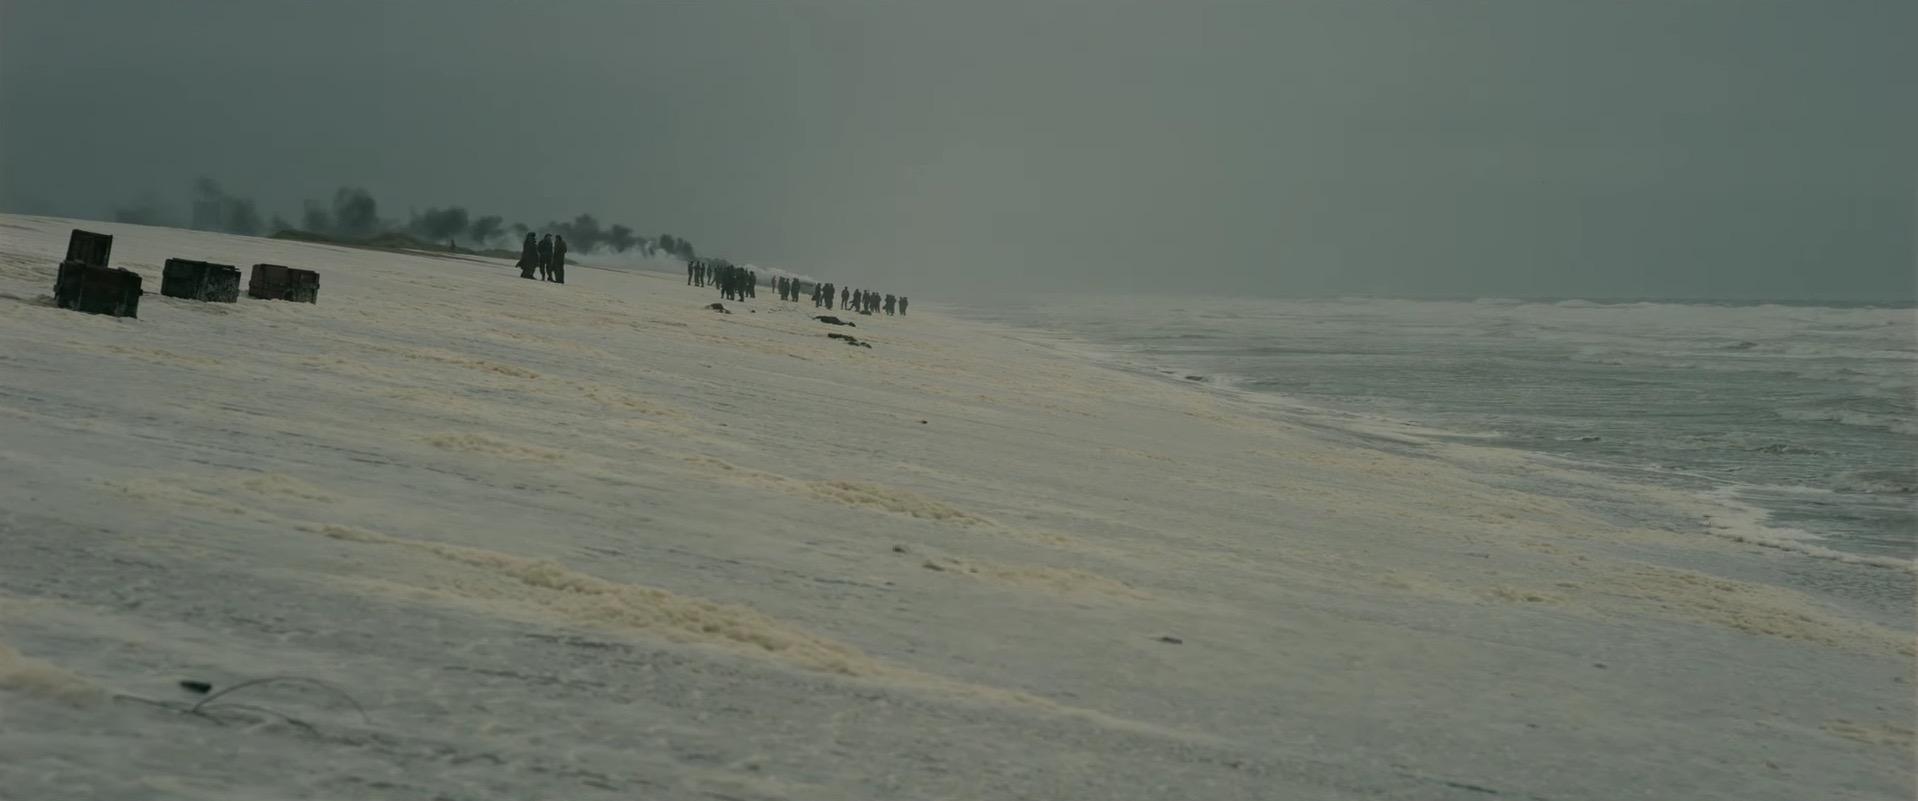 White foam on the beach in DUNKIRK (2017).